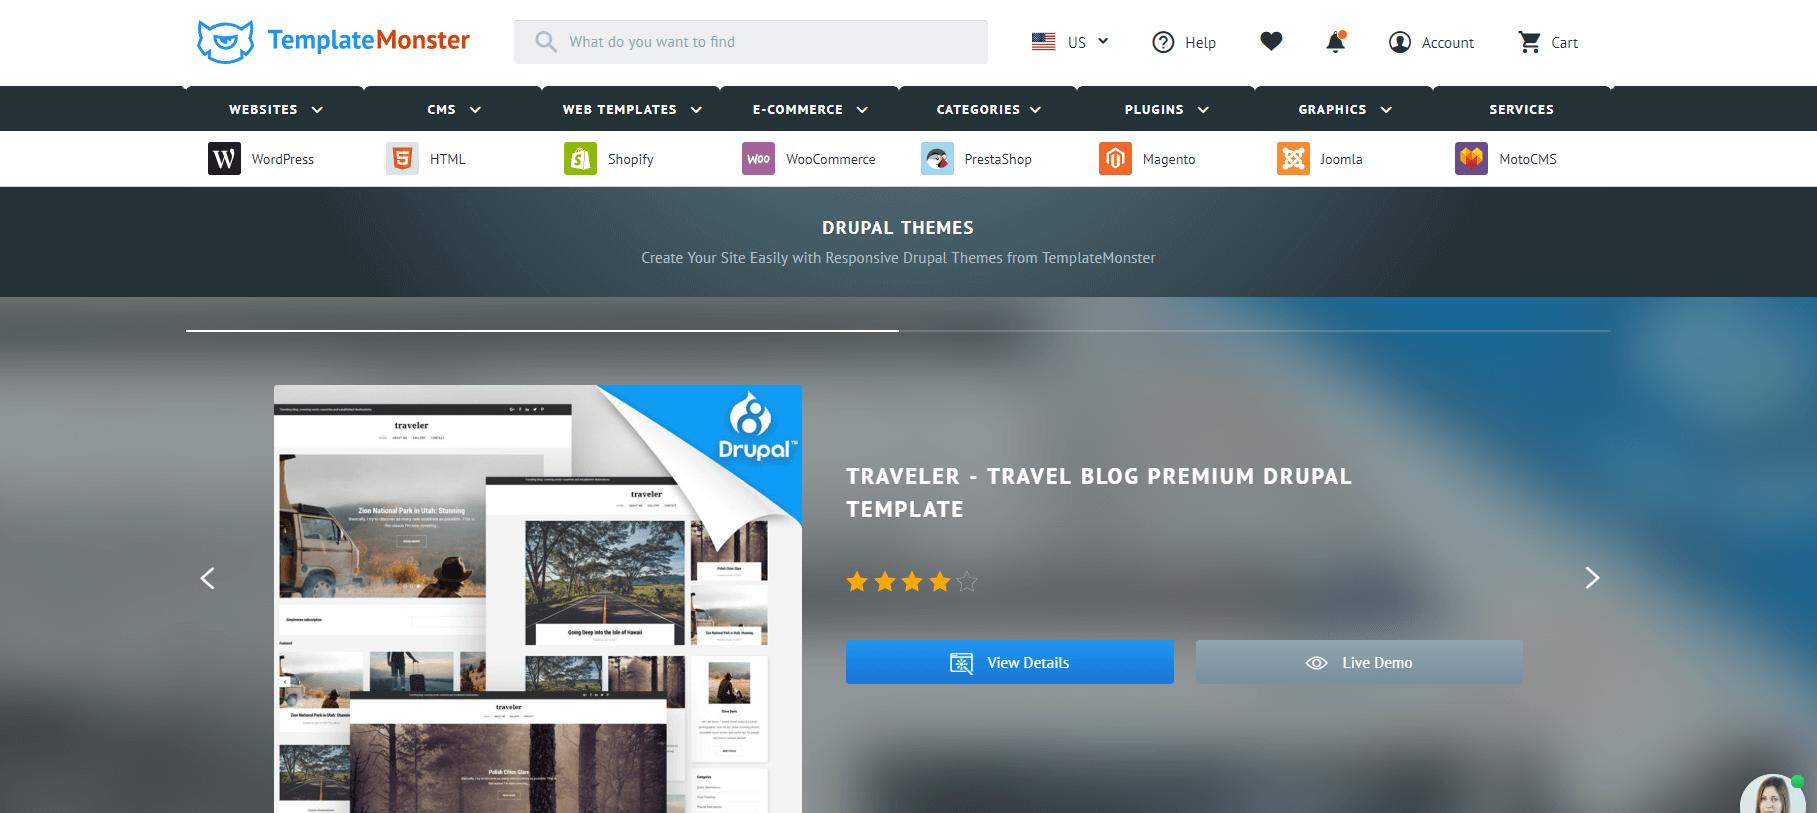 The TemplateMonster website.